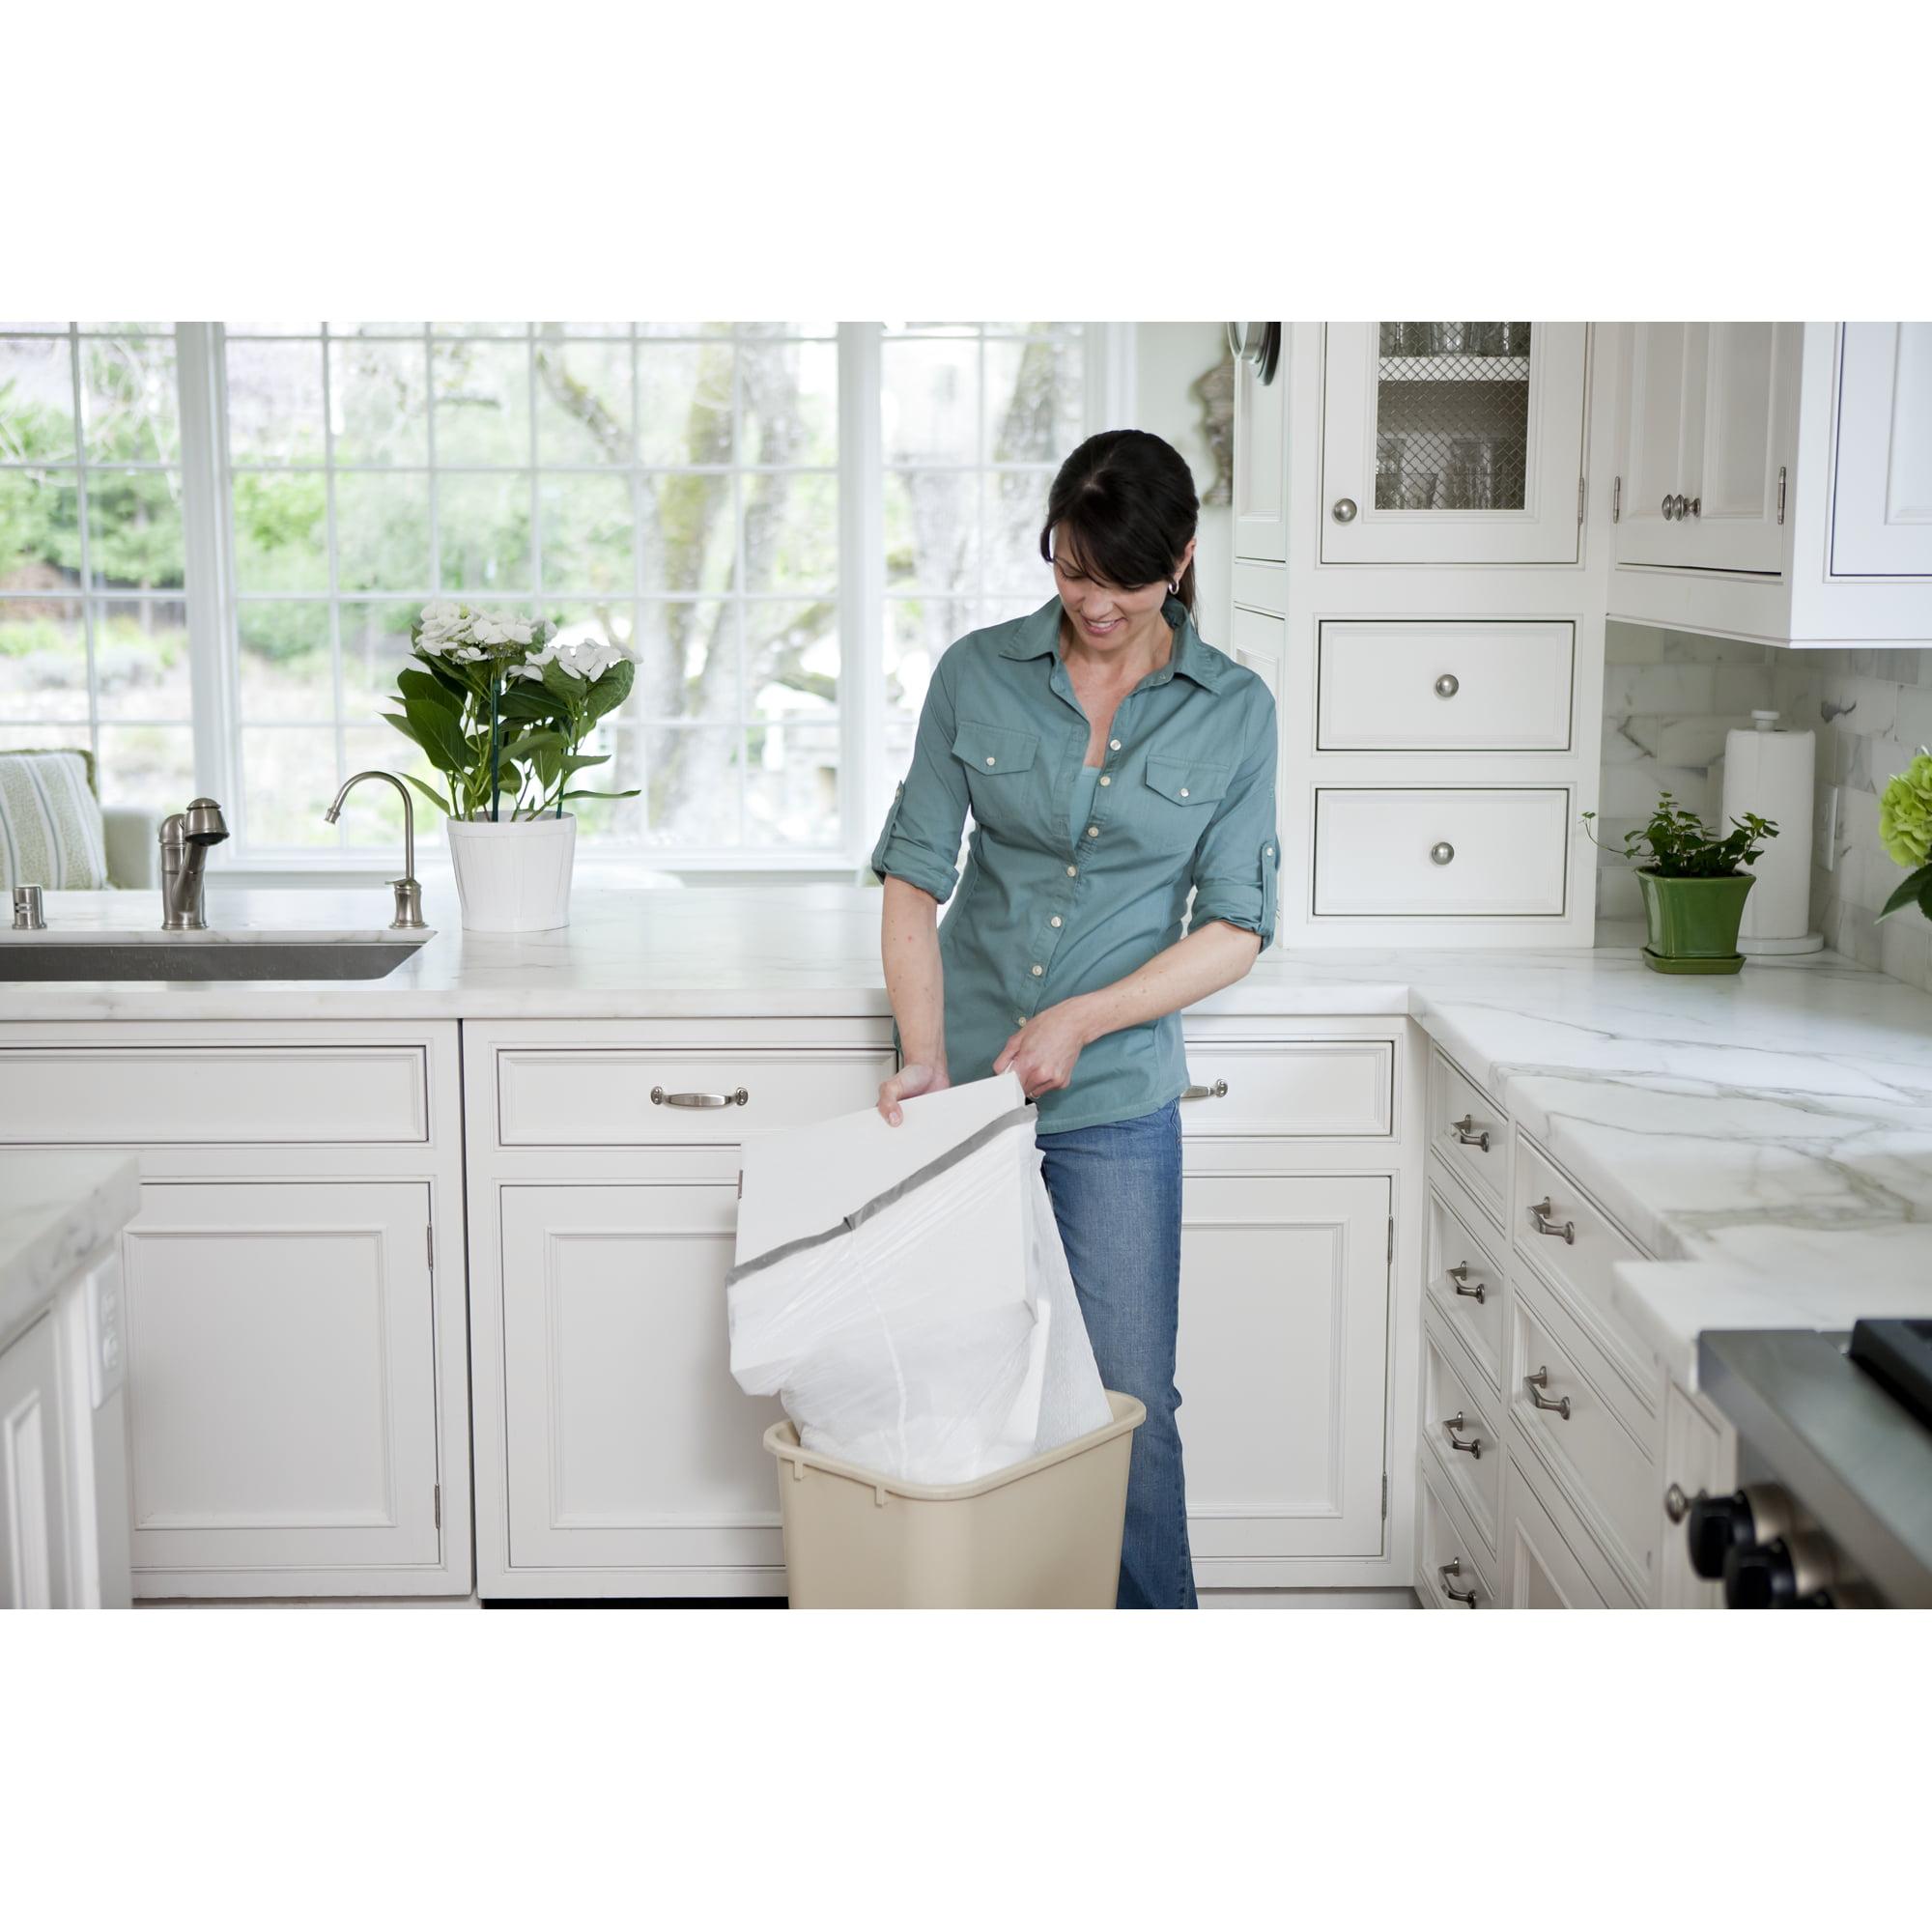 Glad Tall Kitchen Drawstring Trash Bags - 13 gal - 120 ct - Walmart.com